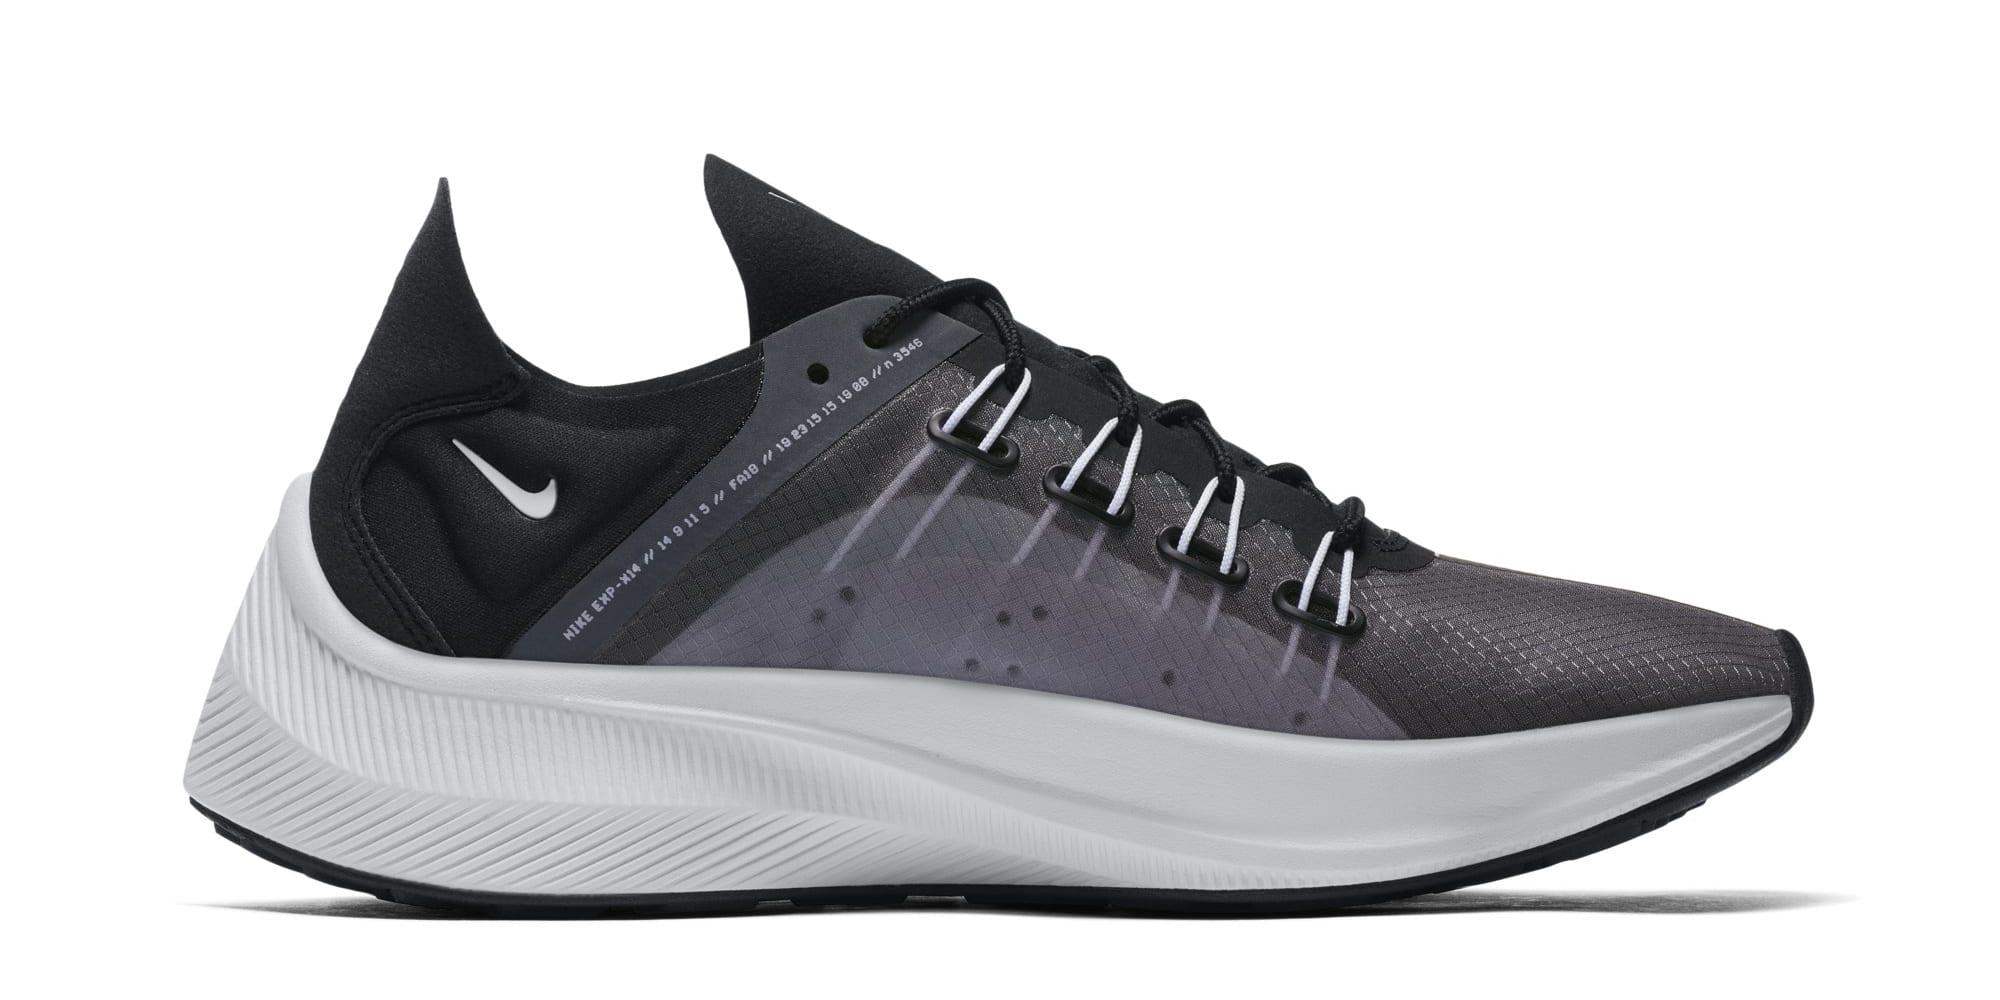 Nike WMNS EXP-X14 'Black/White/Wolf Grey' AO3170-001 (Medial)